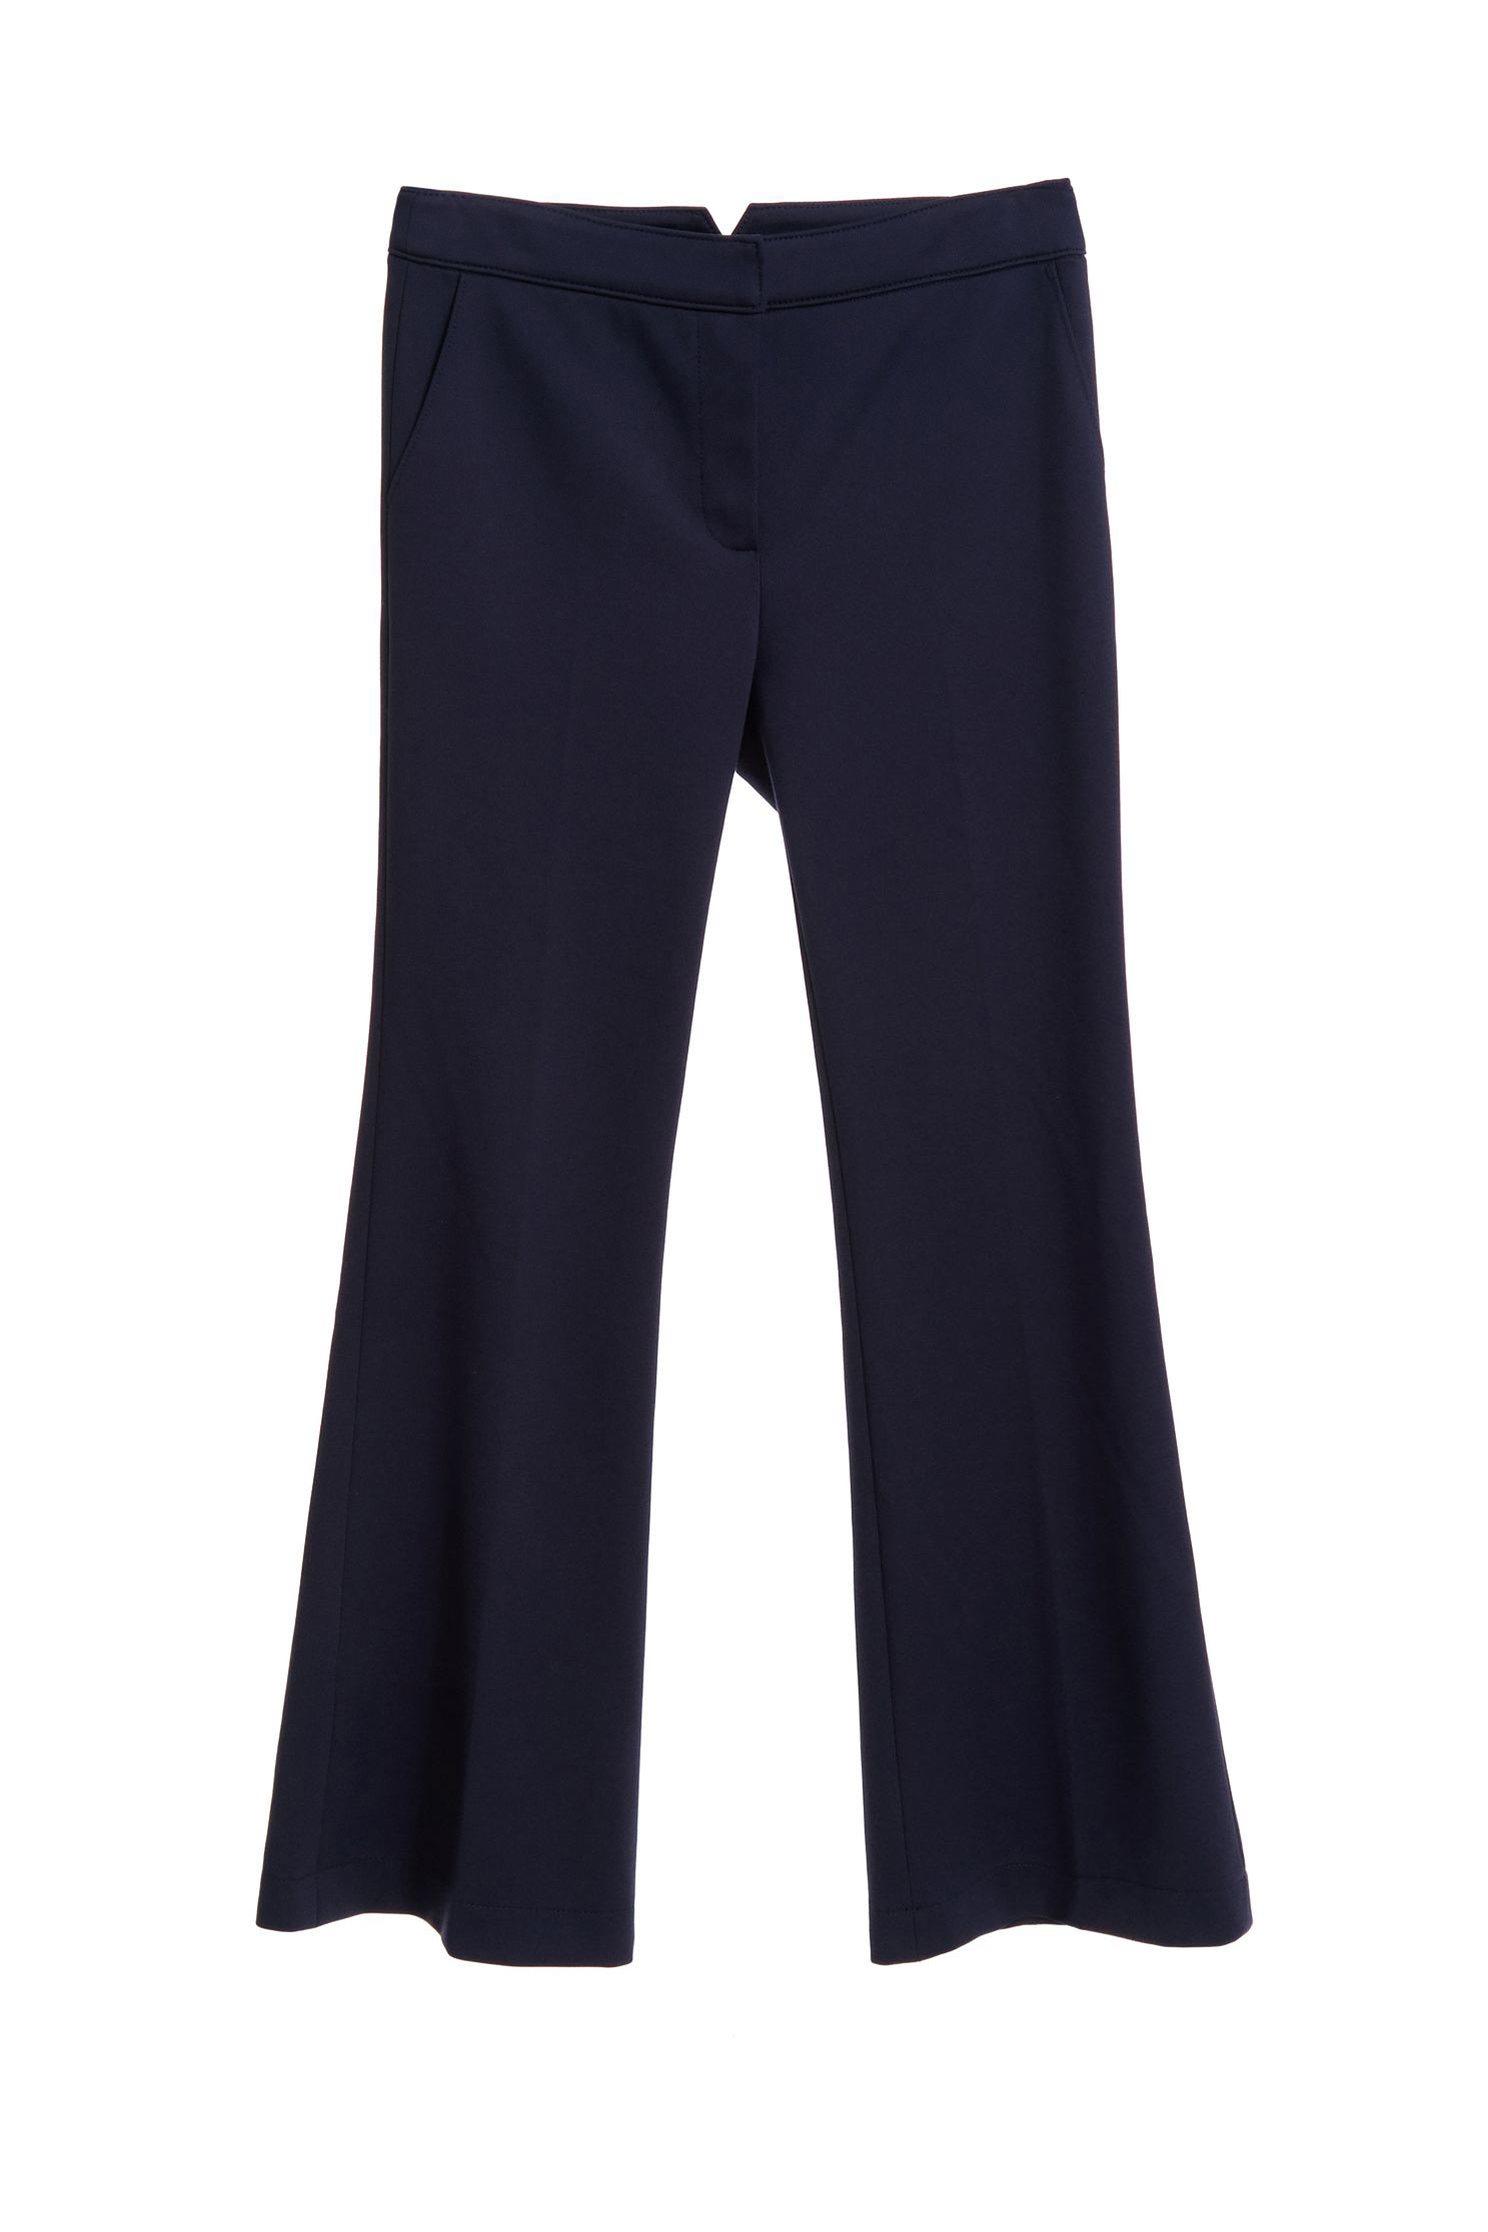 Navy blue twill pants